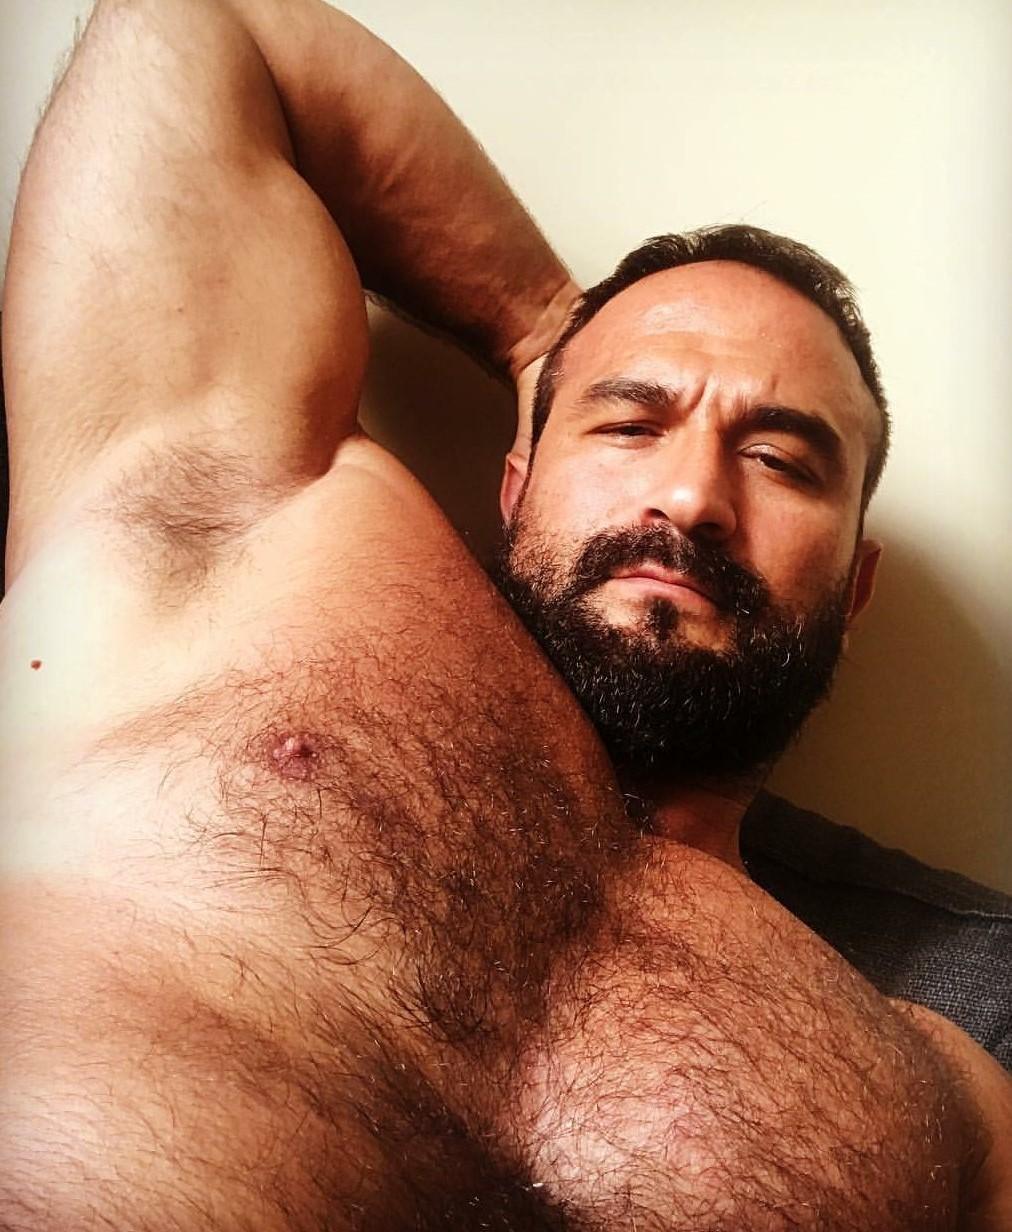 Hairy Chest Alpha Bull - Hairy Gorilla Muscle Pecs - Hairy Pig